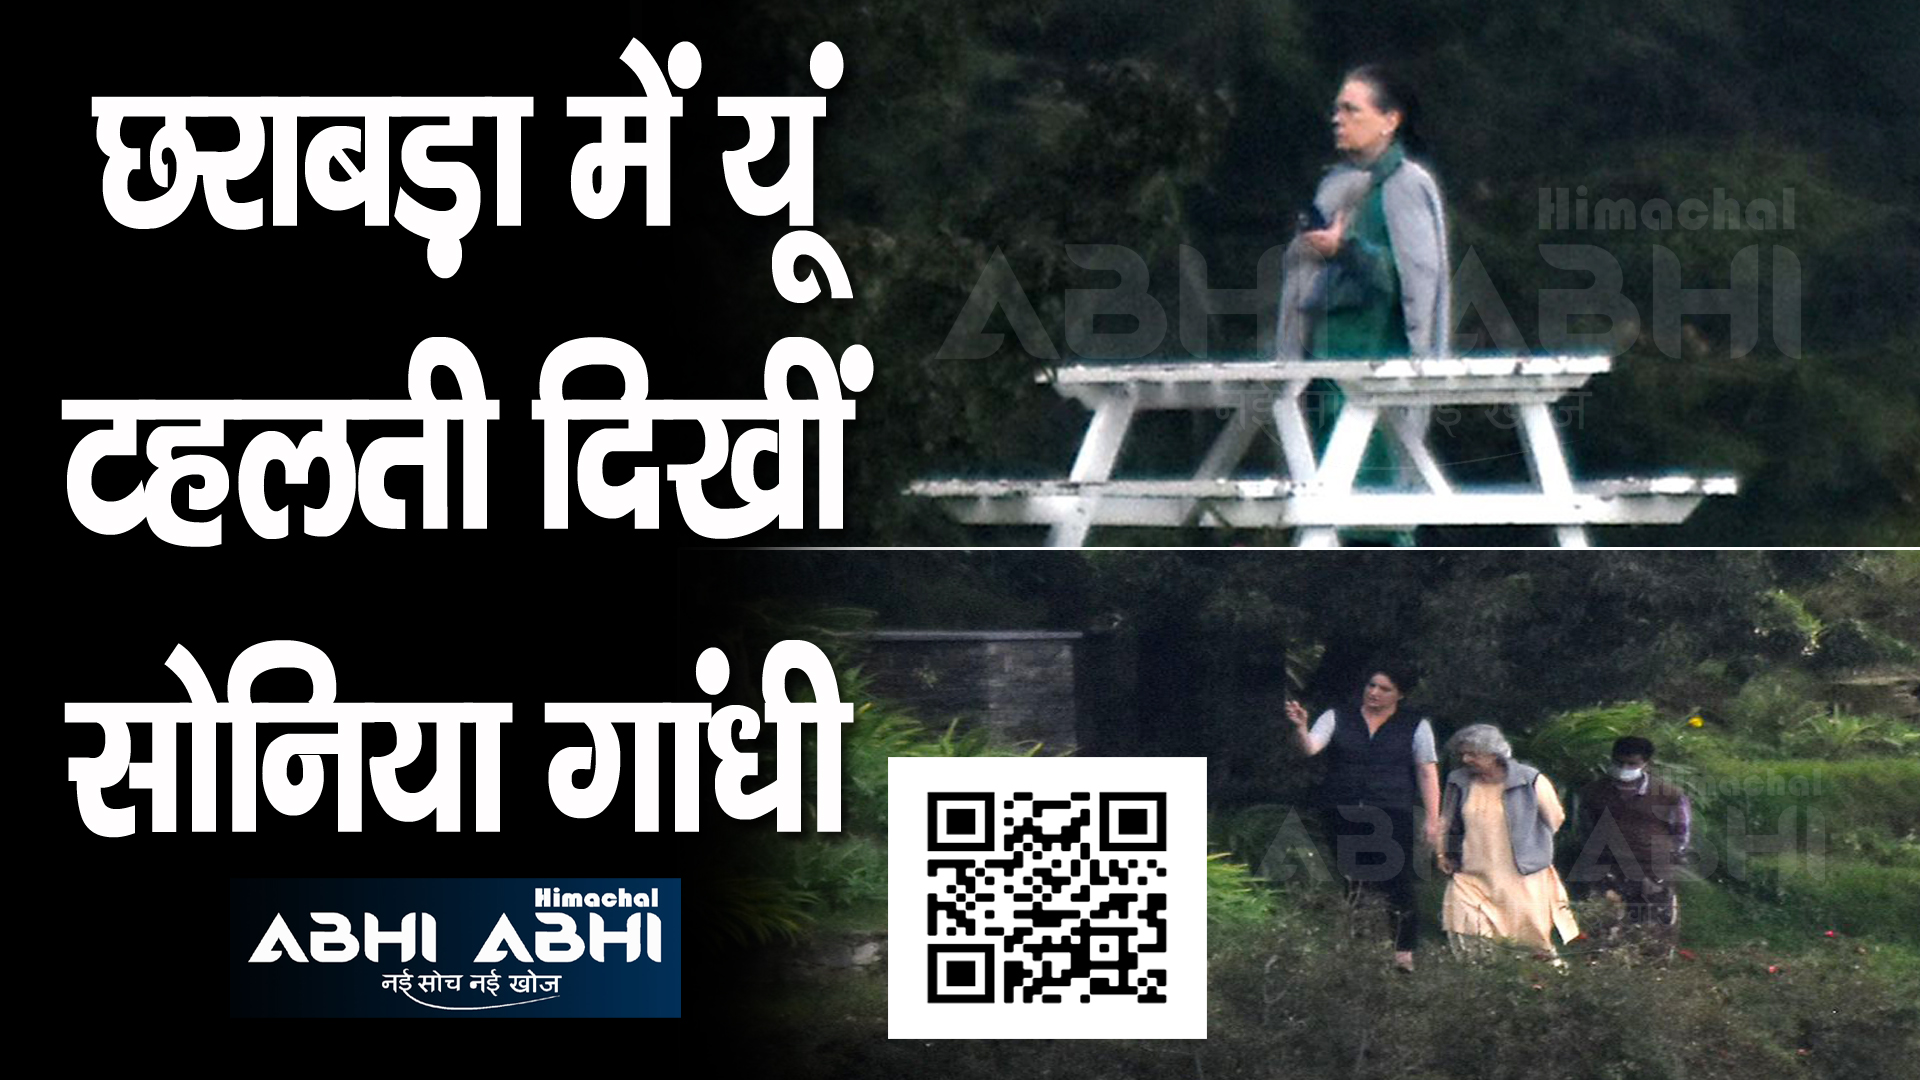 Sonia Gandhi/Chharabra/Priyanka Gandhi